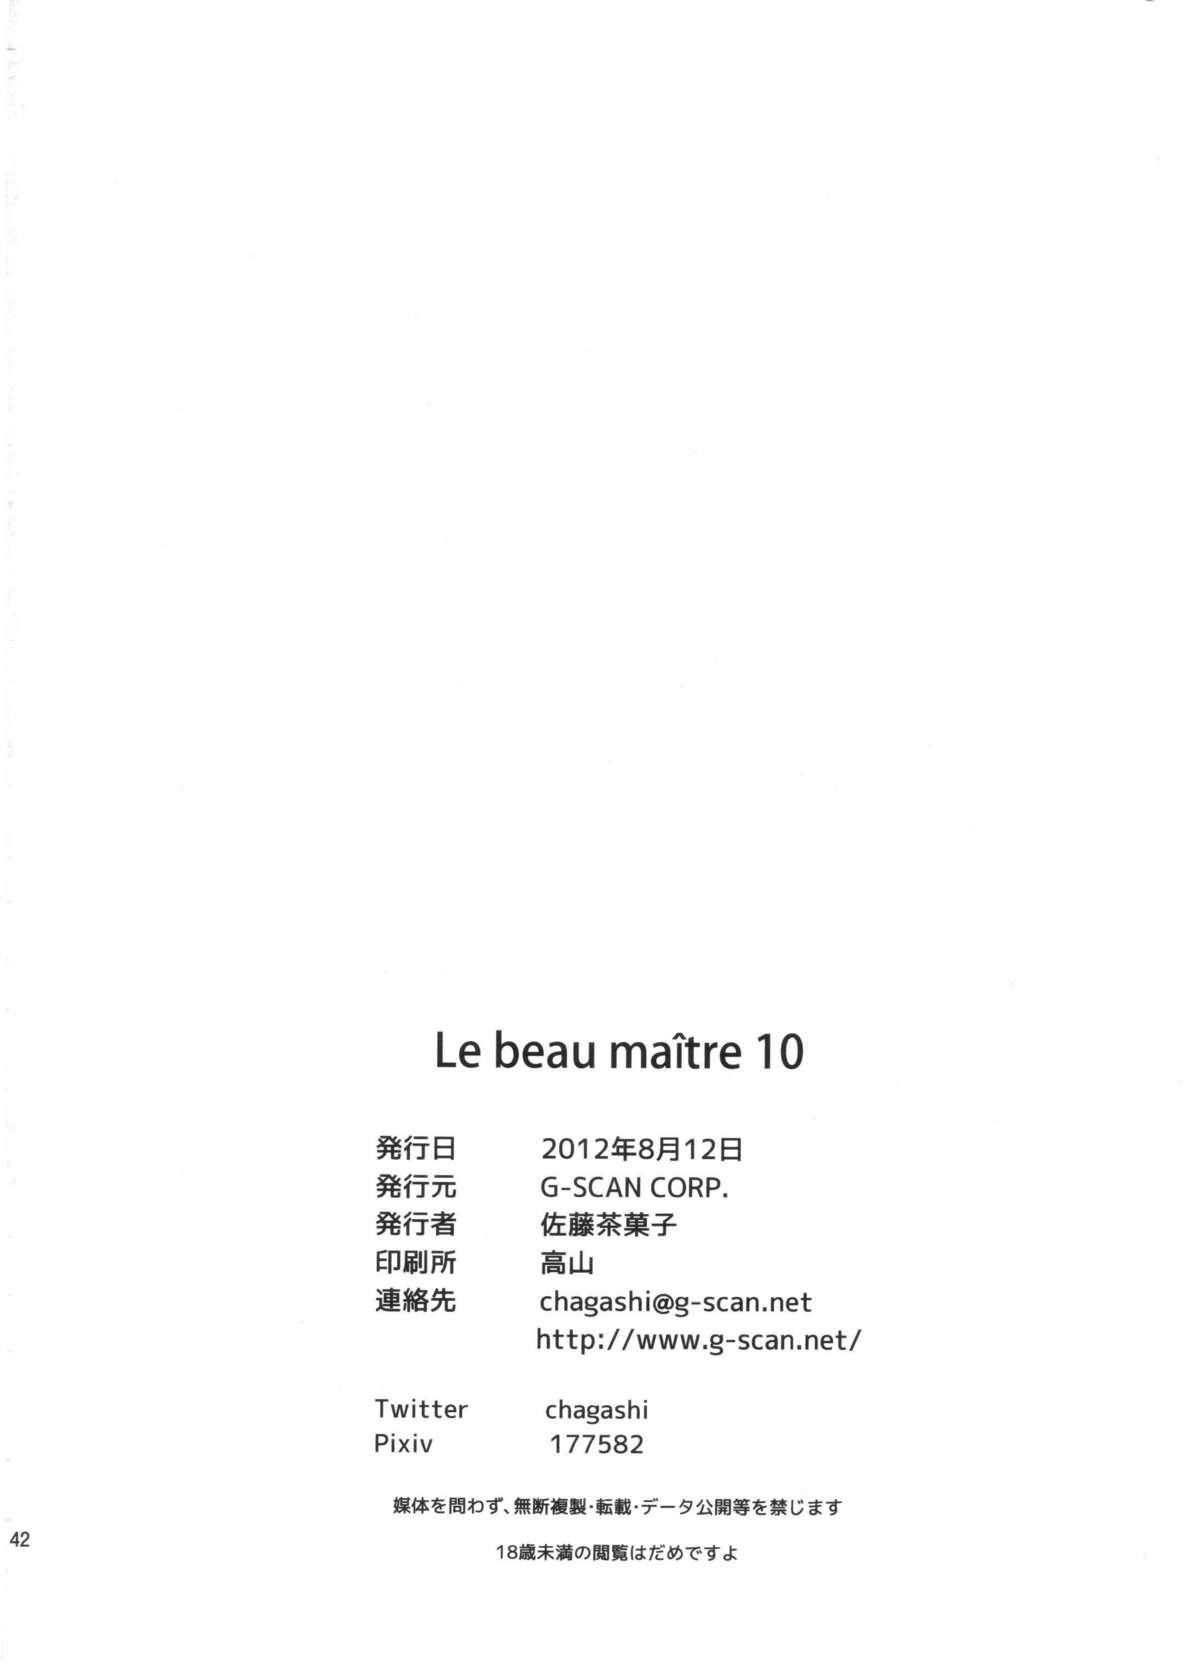 Le beau maitre 10 40